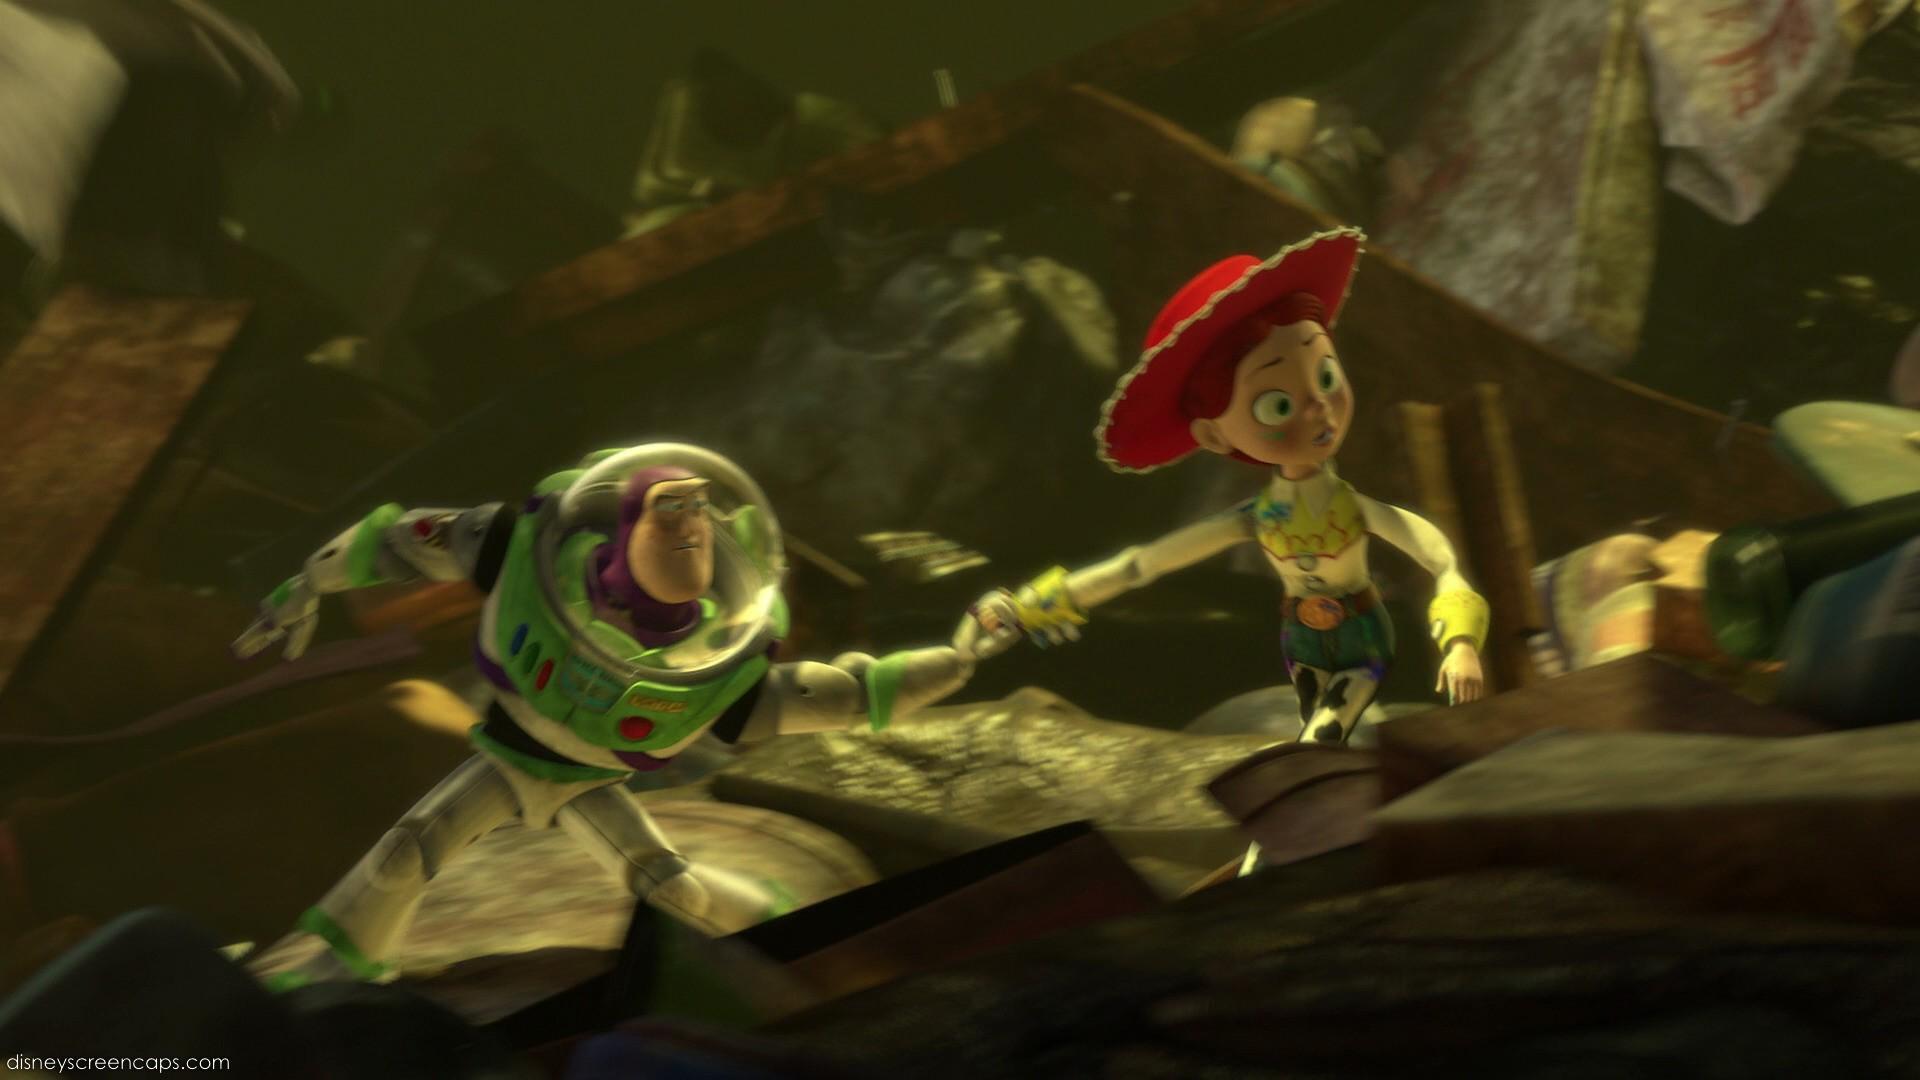 Buzz holds Jessie's hand